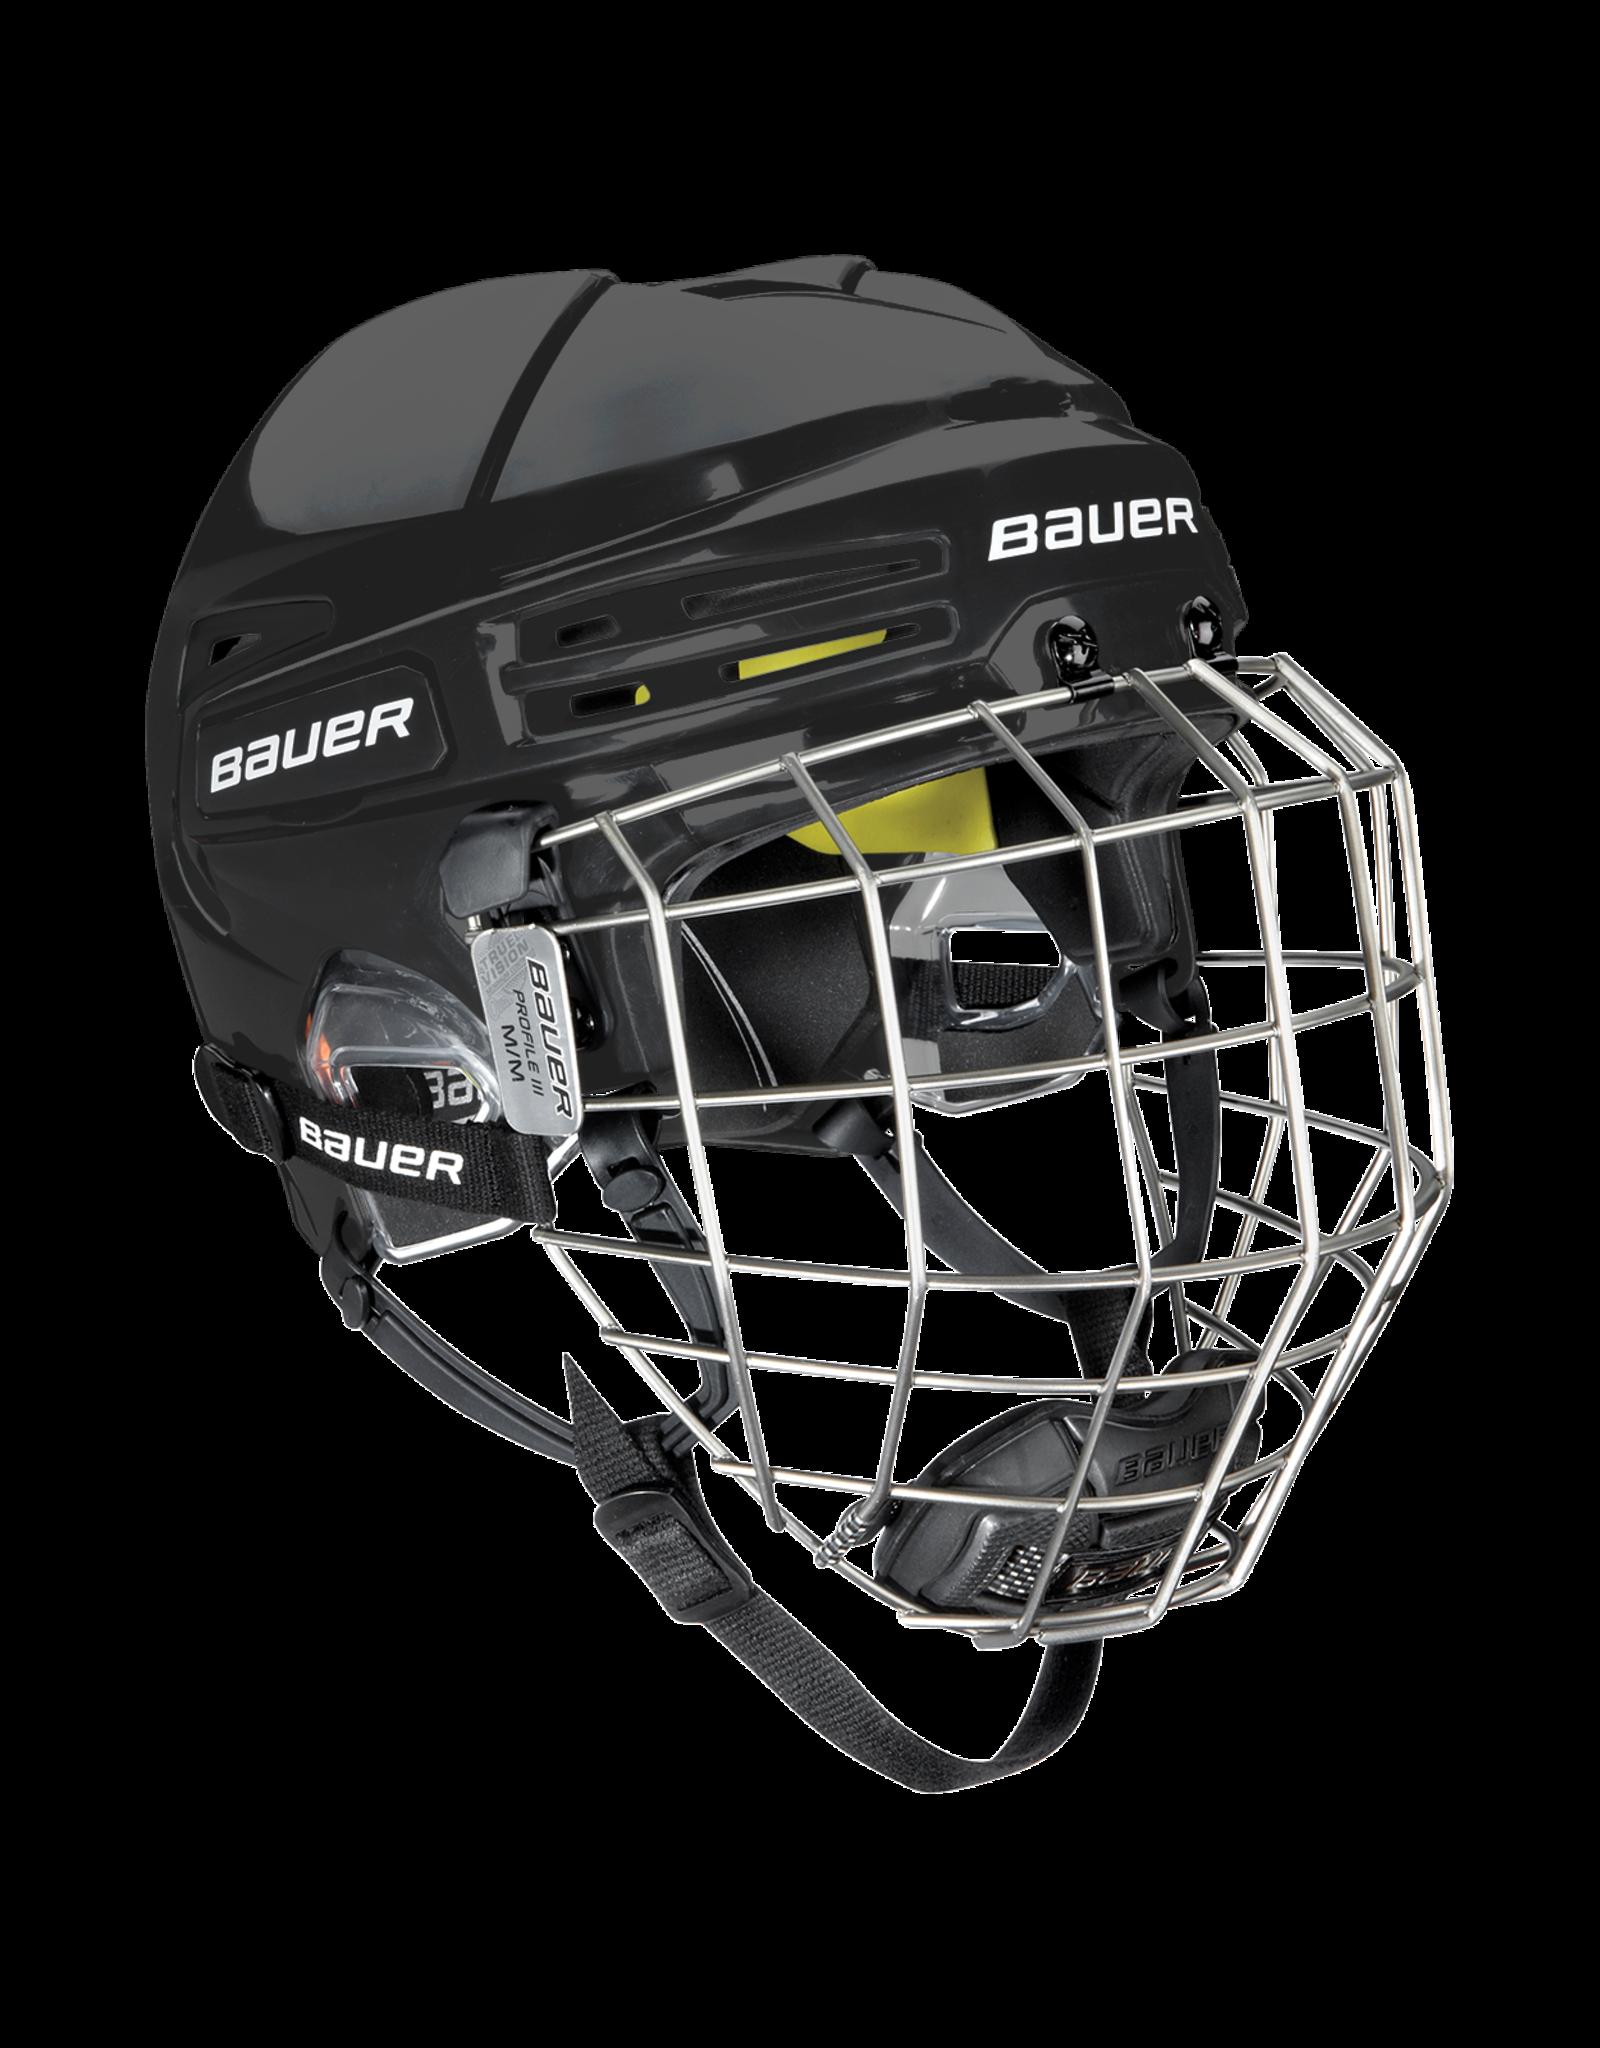 Bauer Hockey - Canada BAUER RE-AKT 75 HELMET COMBO